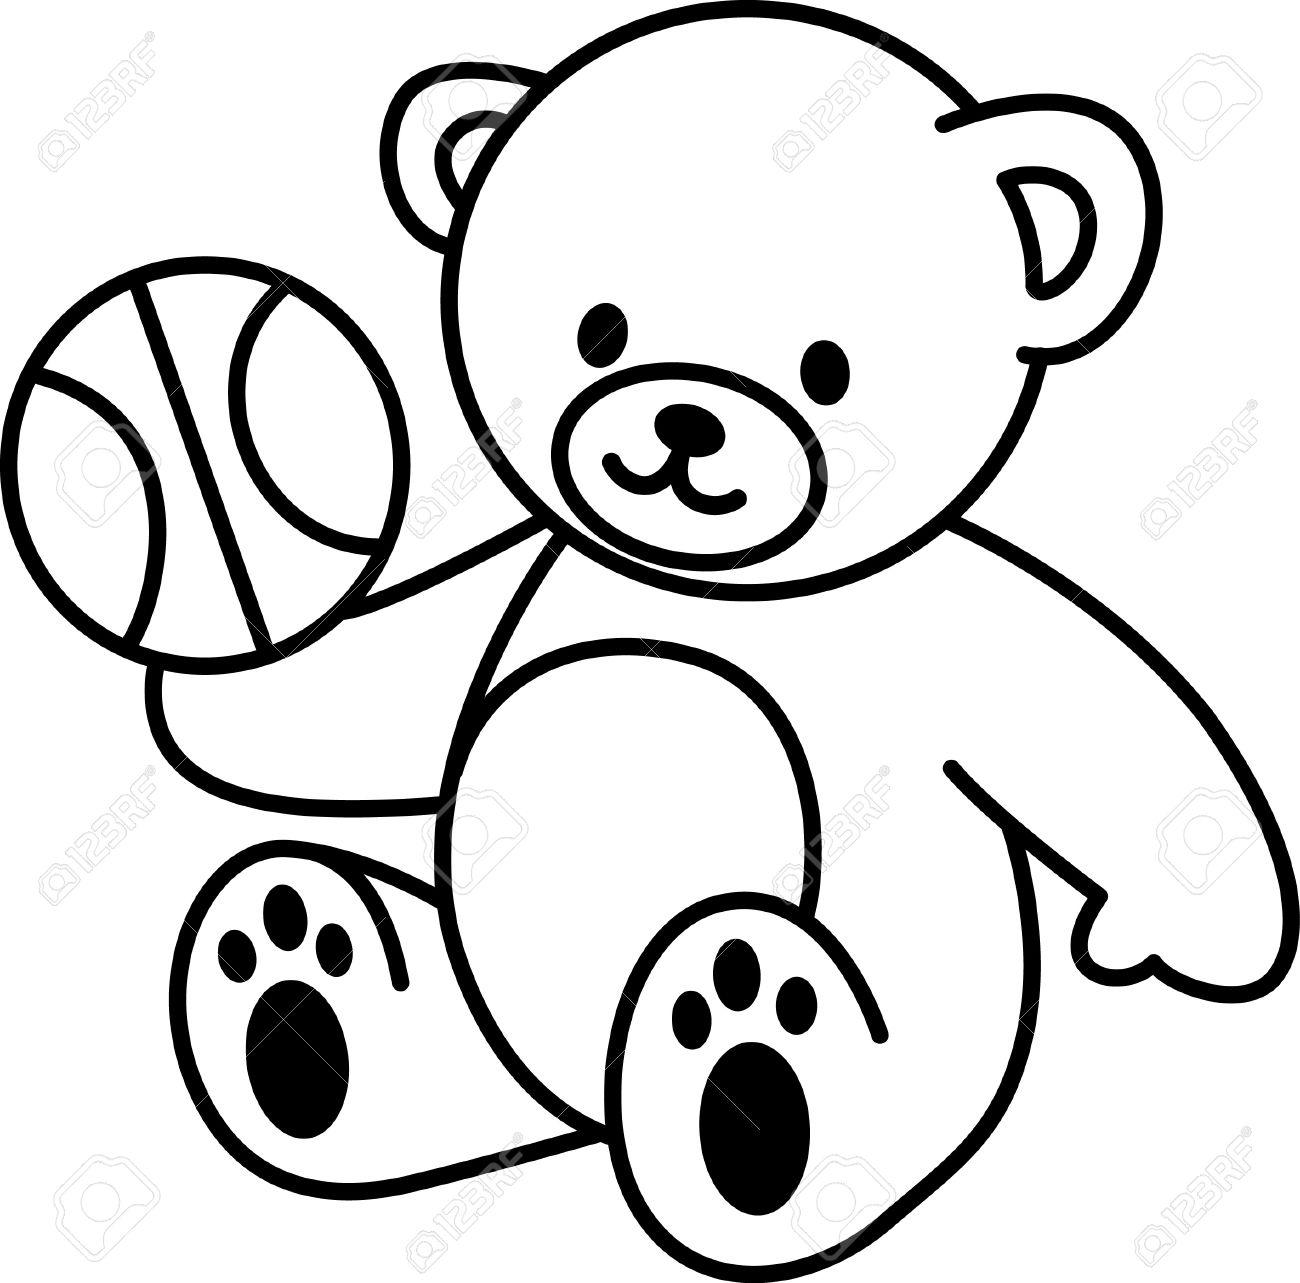 Teddy Bear Drawing Images At Getdrawings